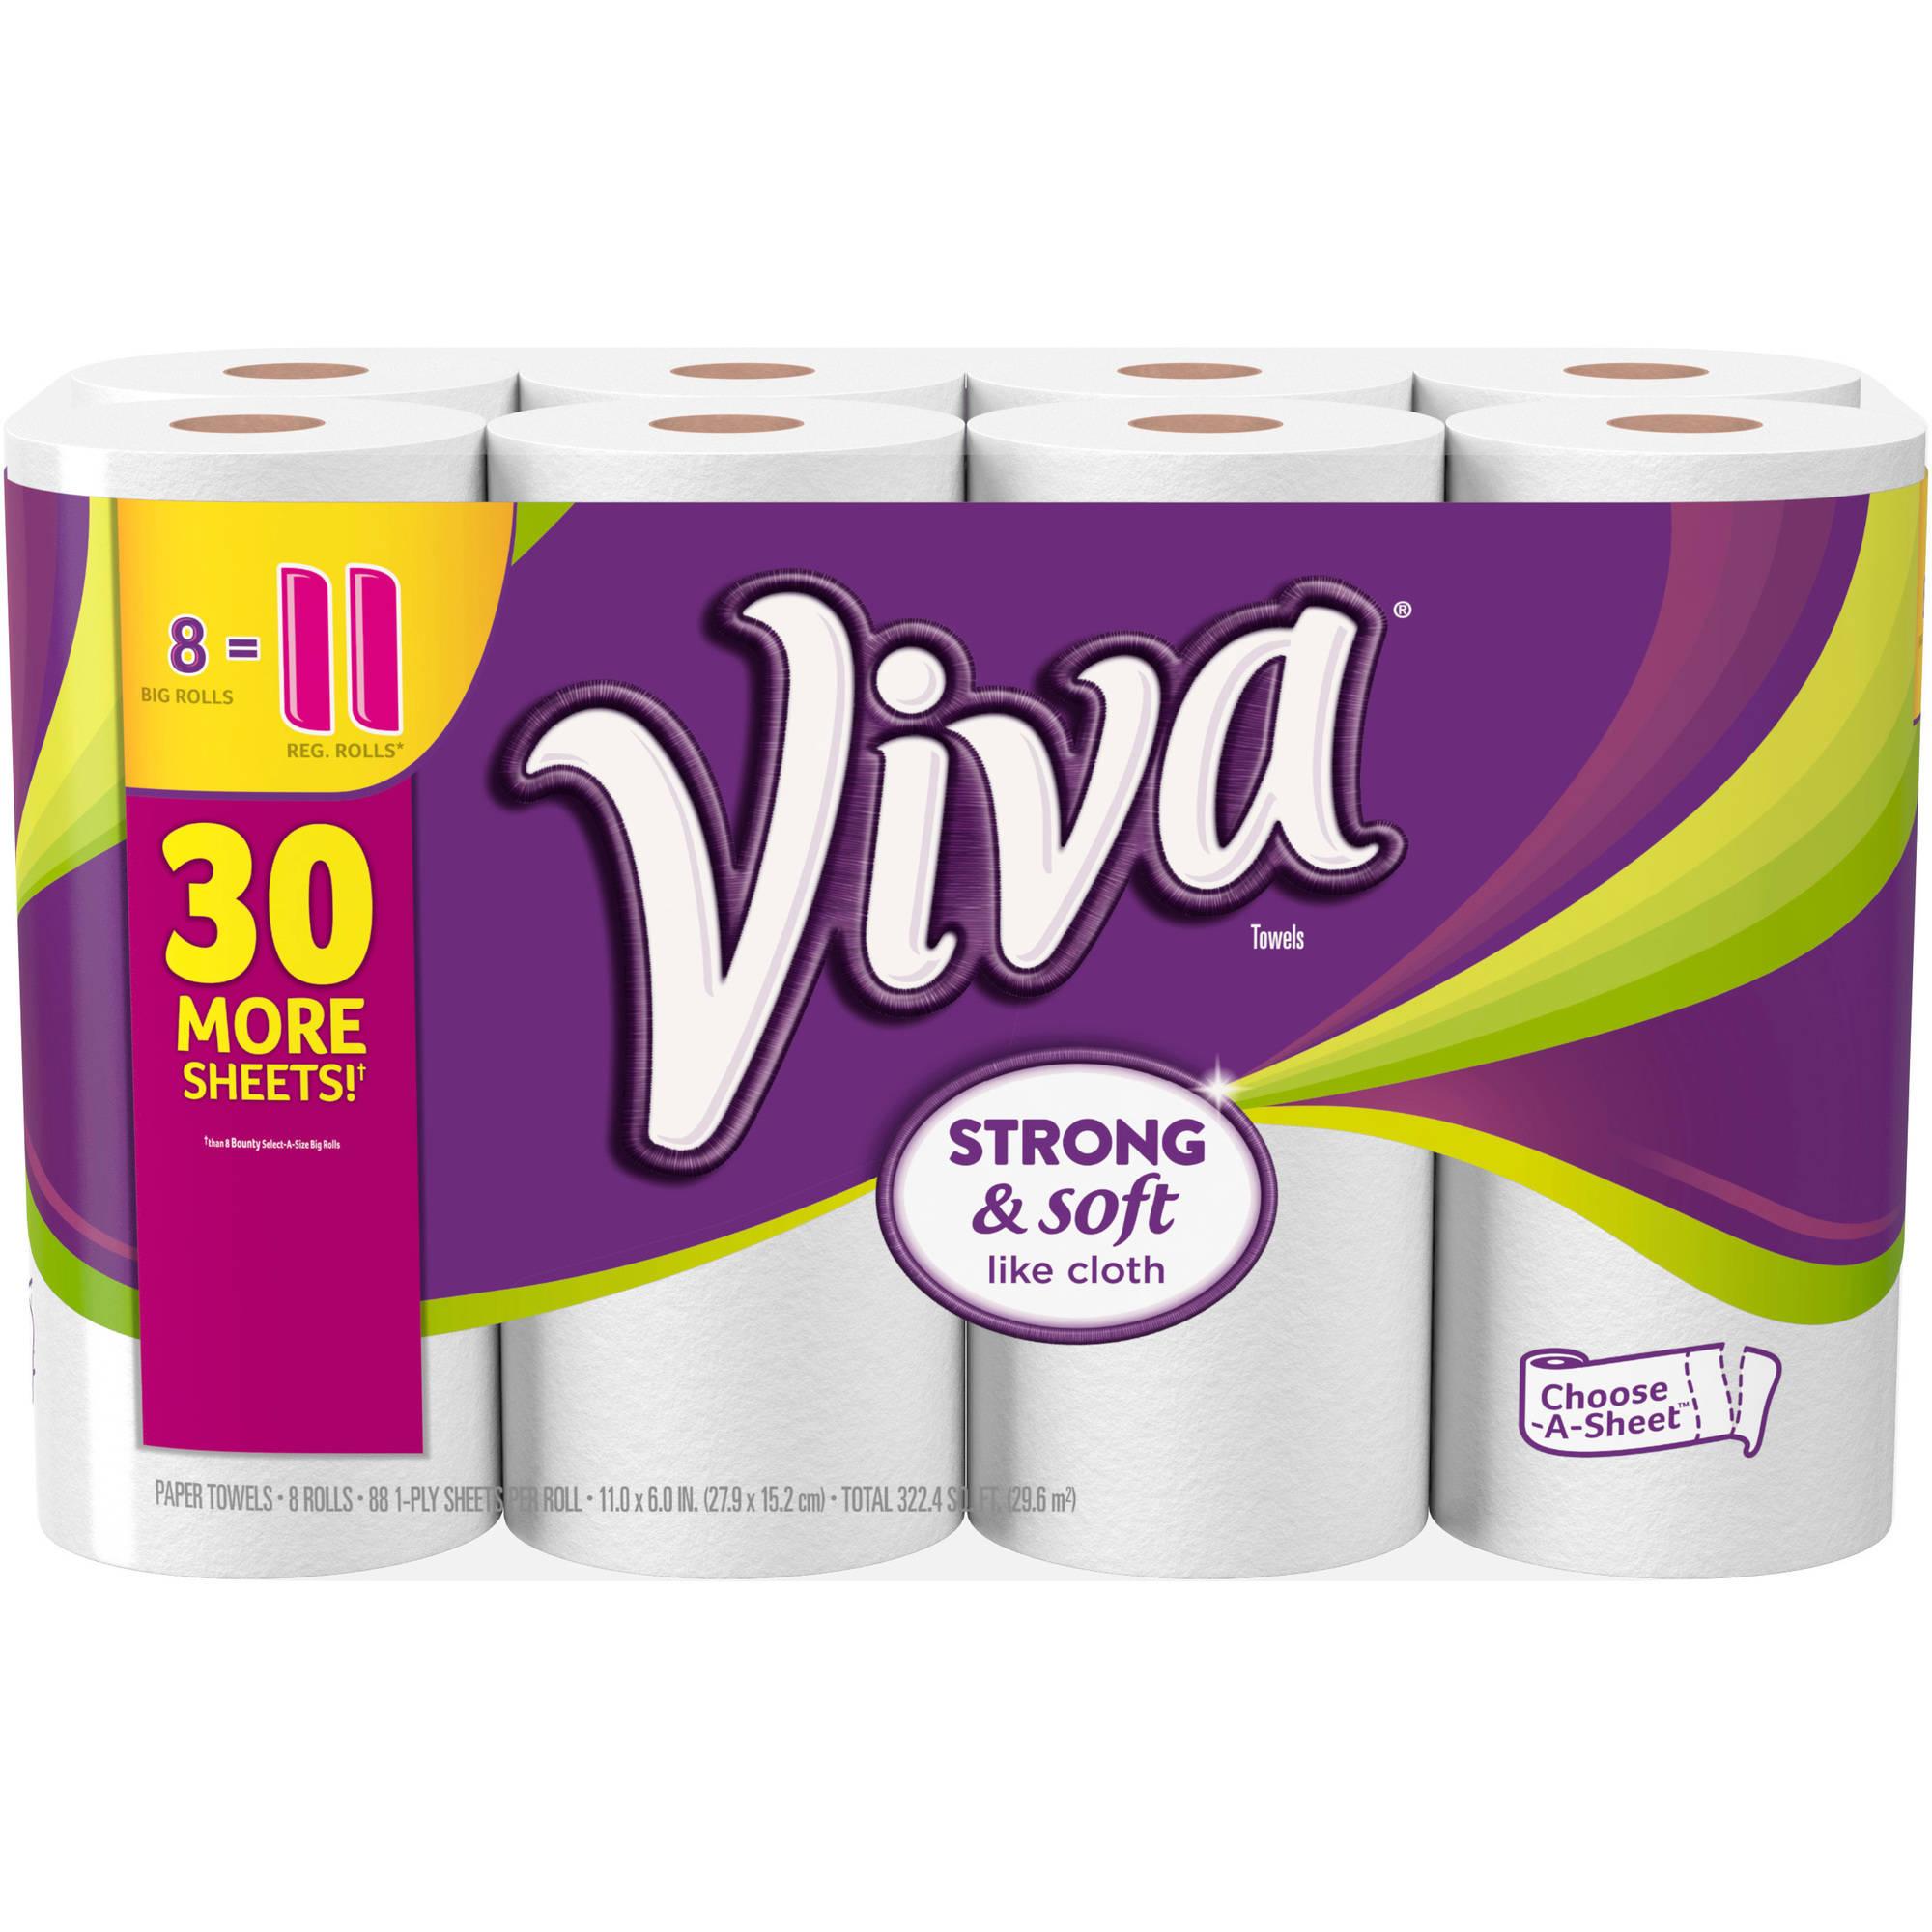 VIVA Choose-a-Sheet Big Roll Paper Towels, White, 88 sheets, 8 rolls